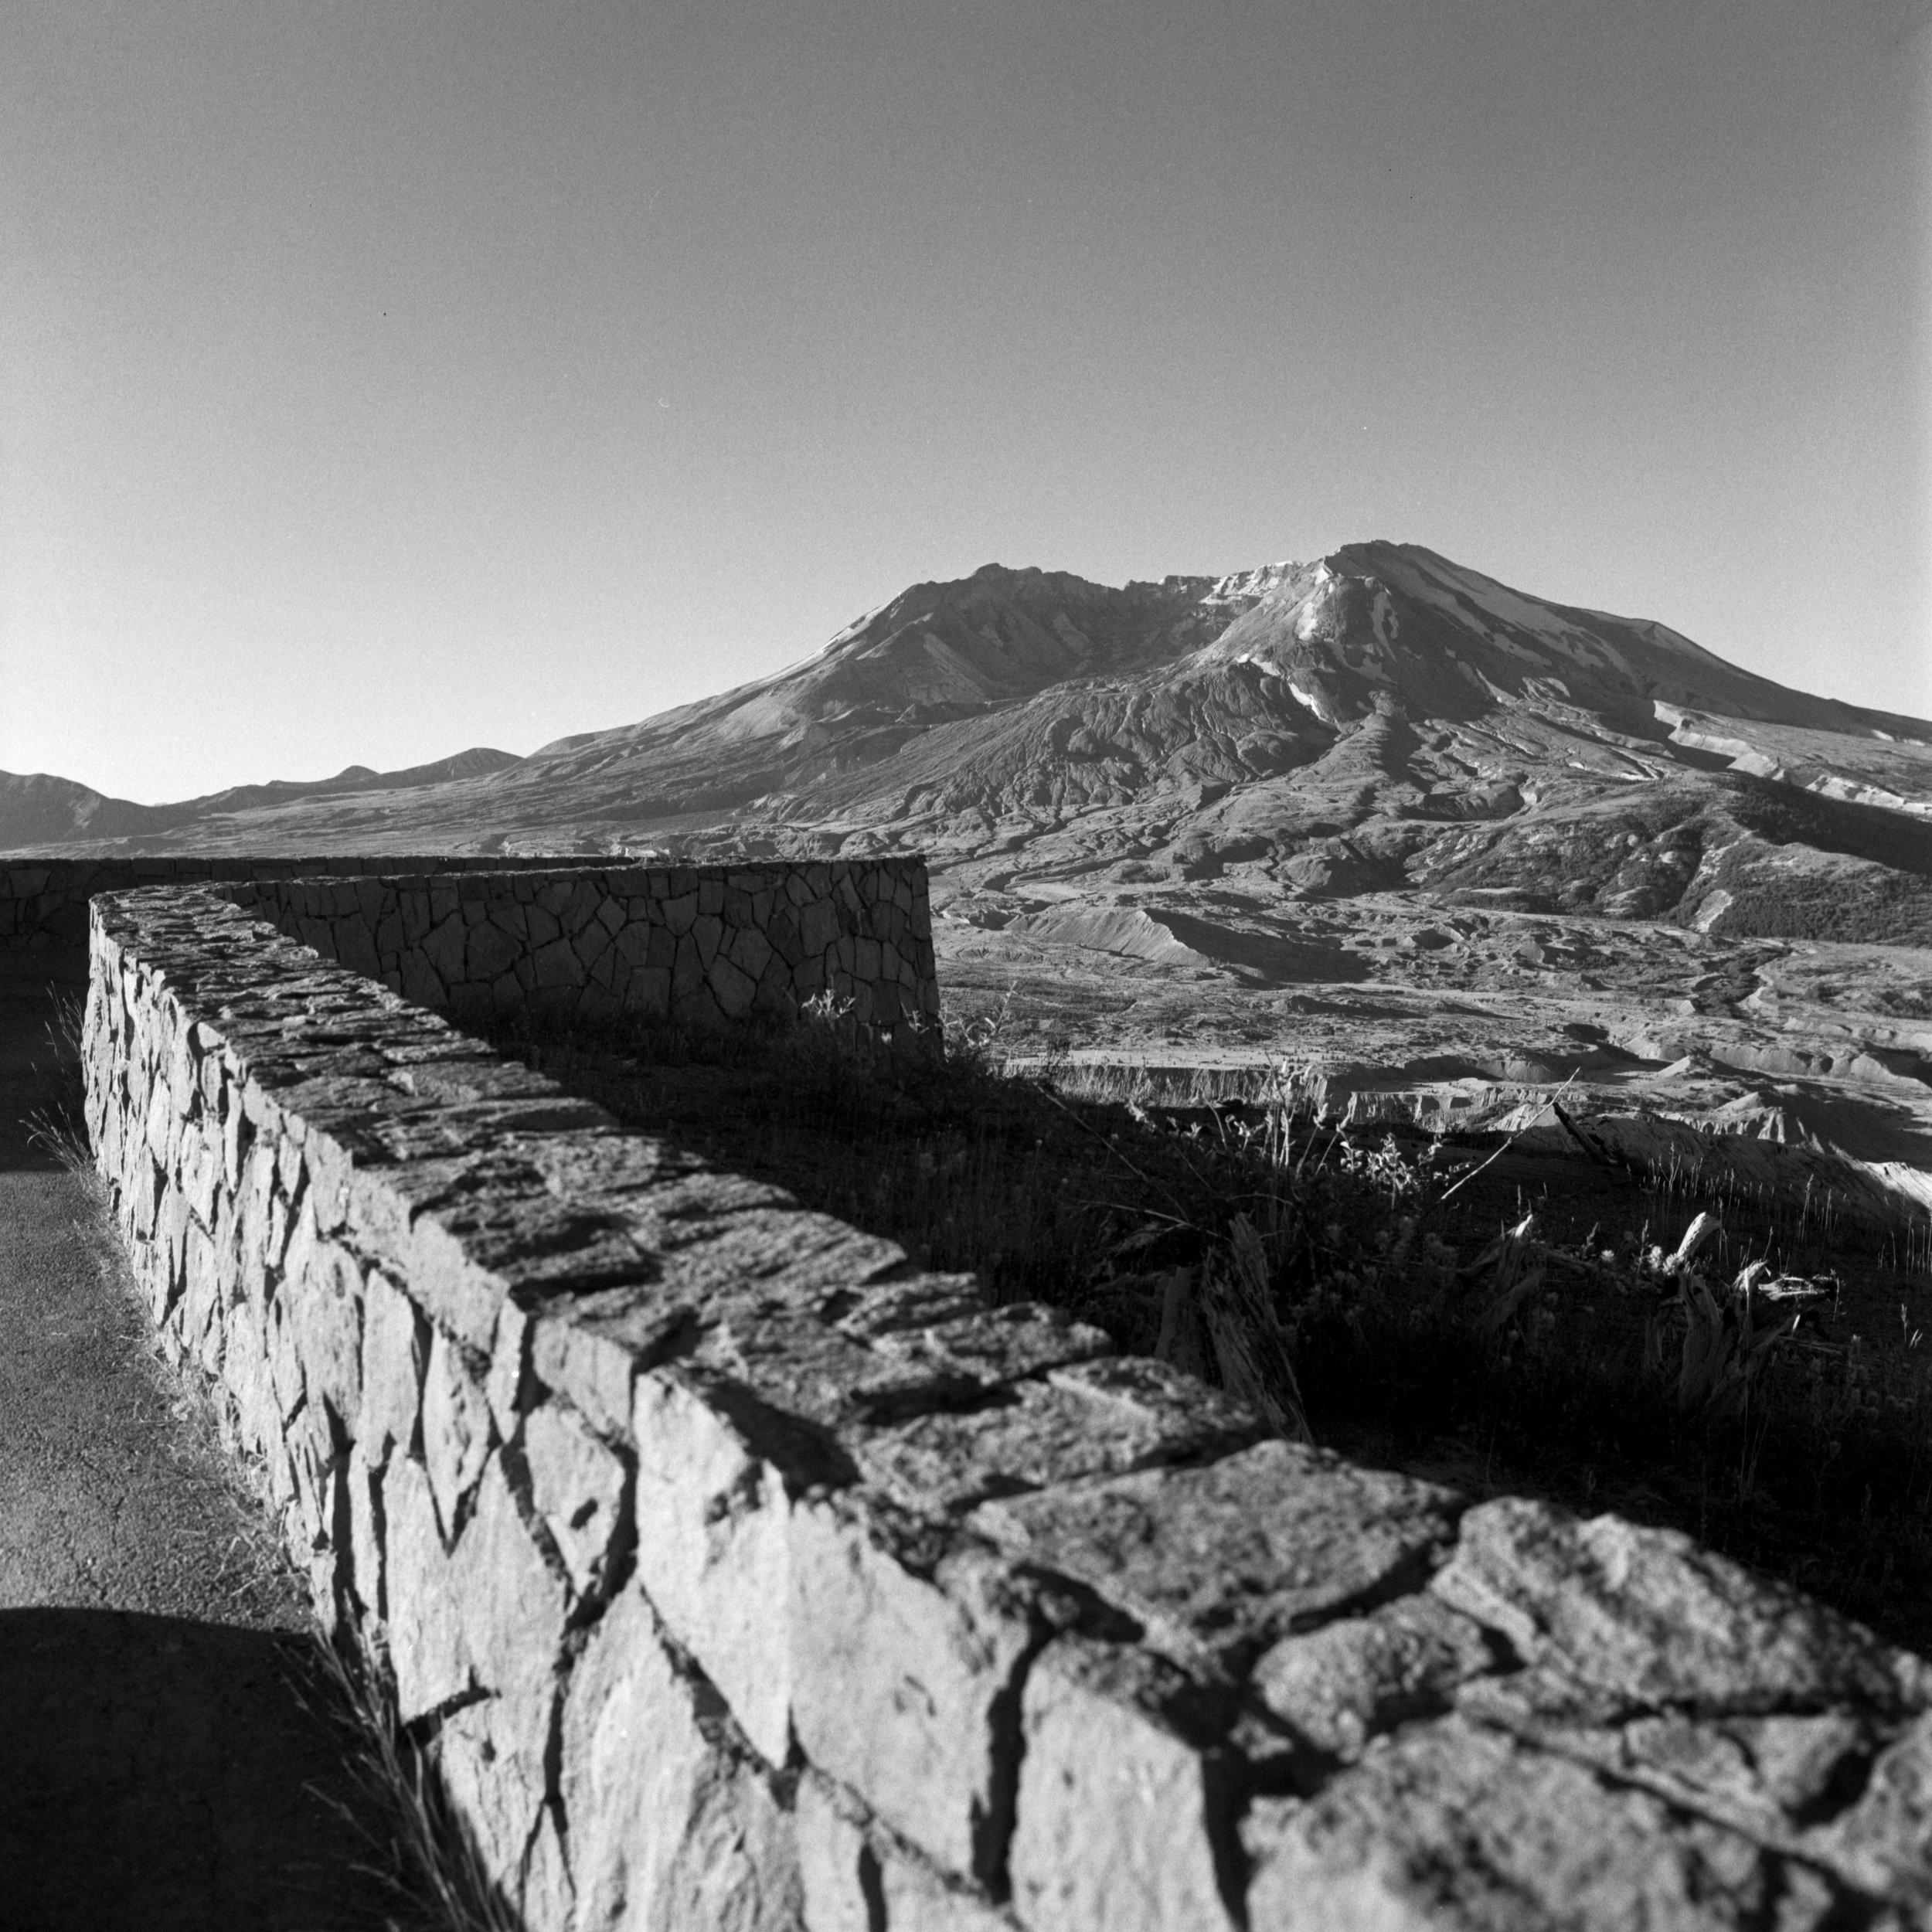 Mt St Helens, July 2017